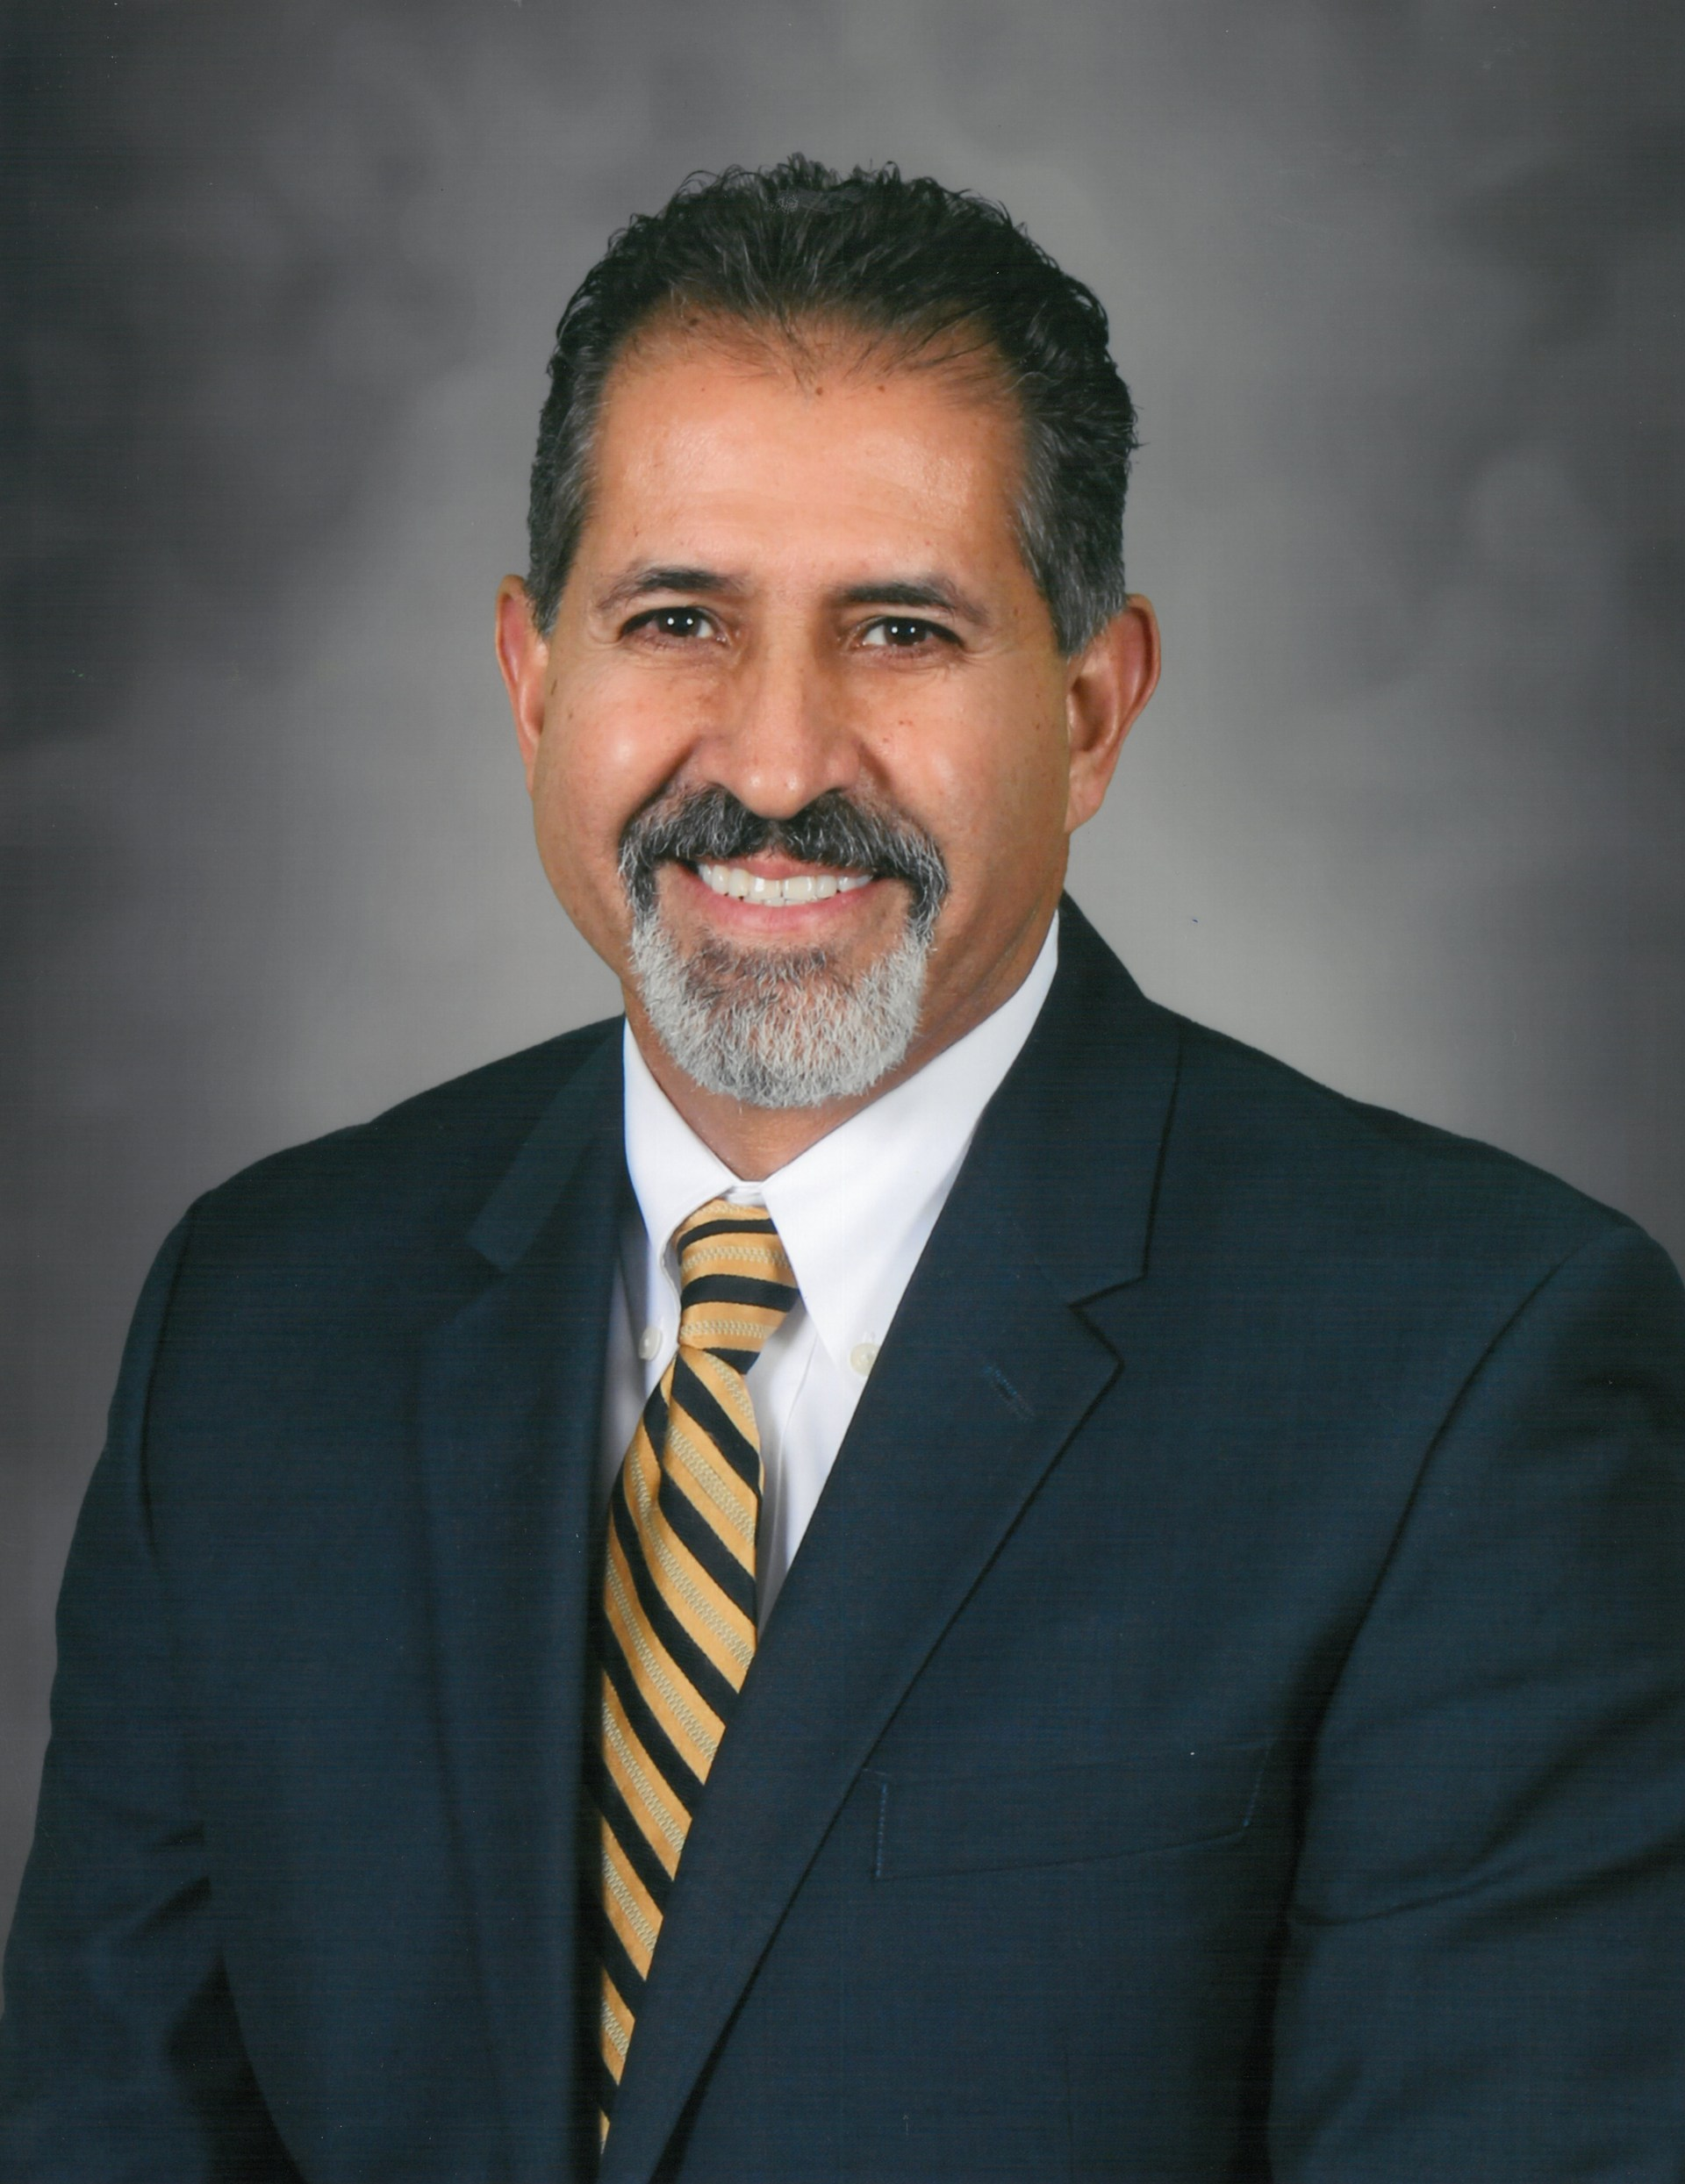 Superintendent Manzo